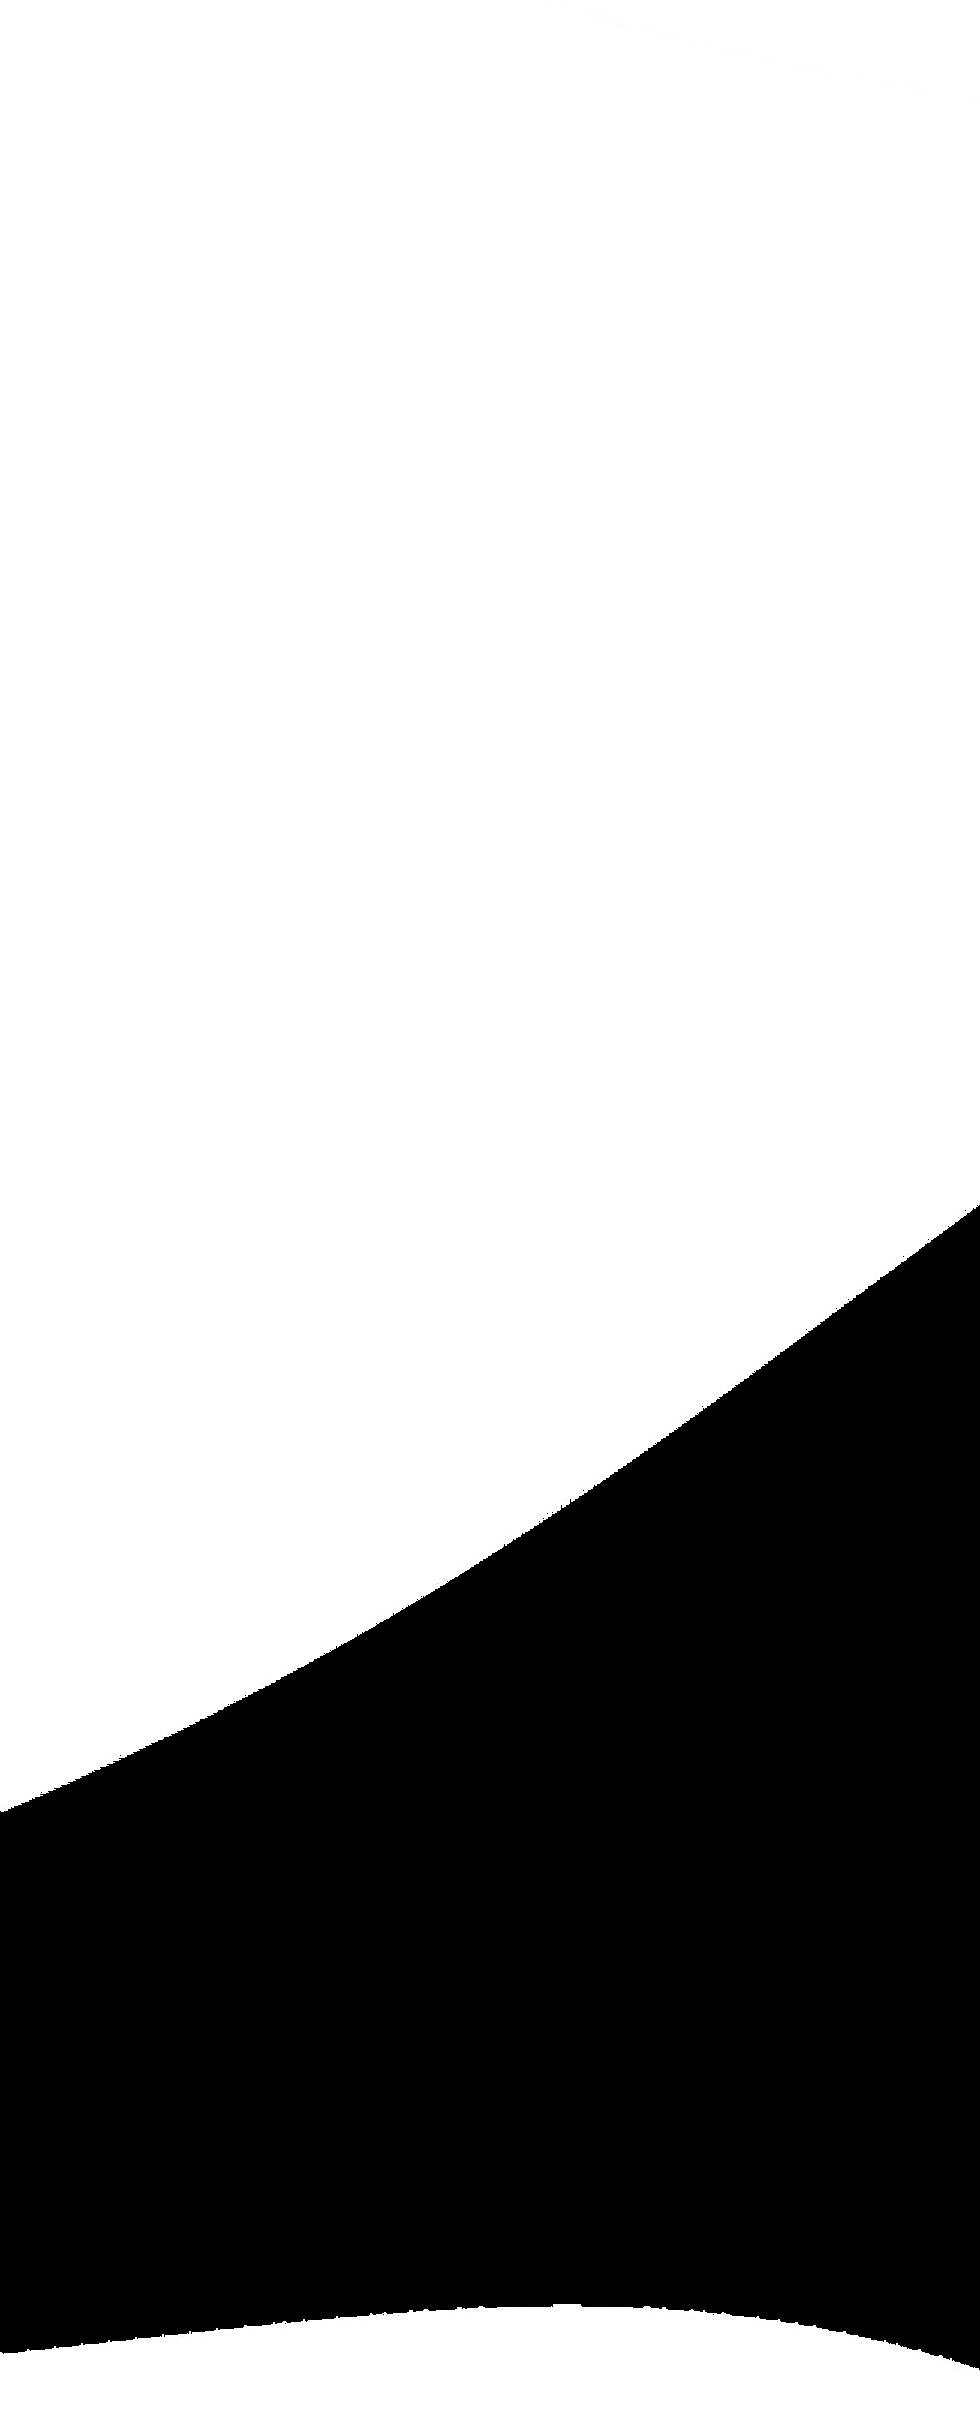 Fondo gris ondulada